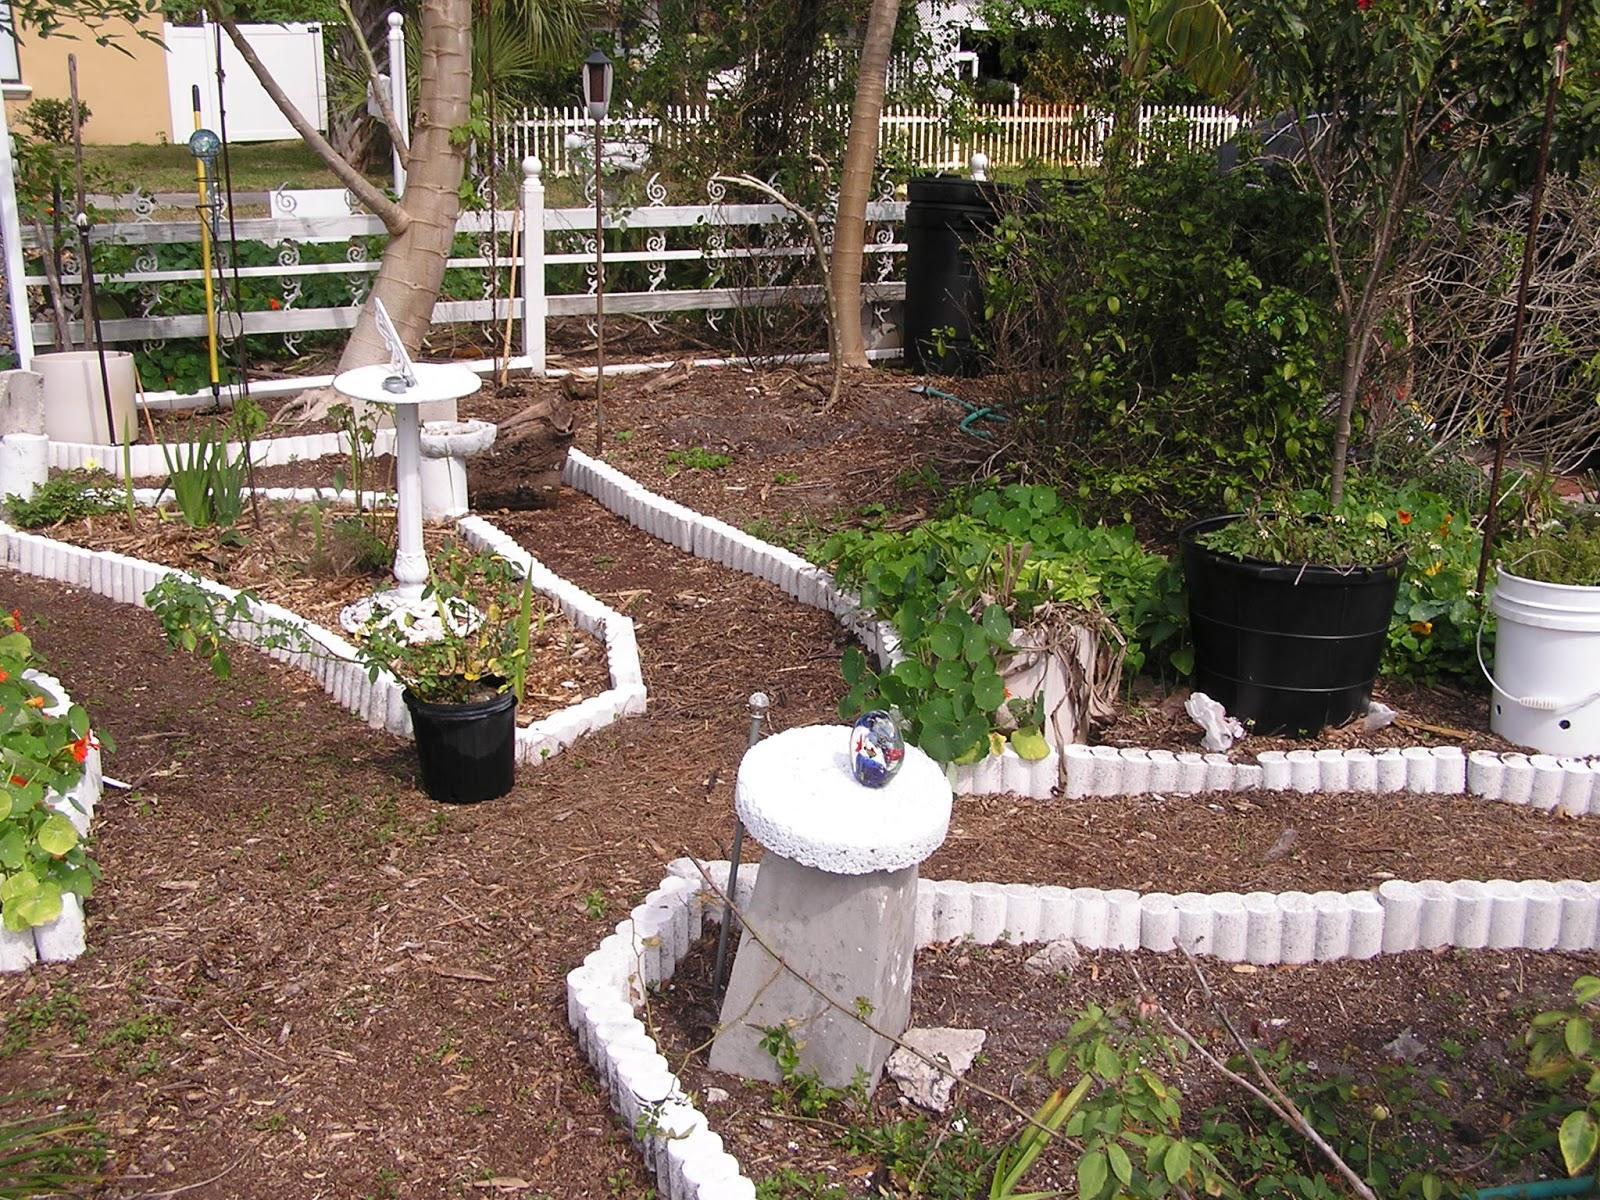 Backyard Garden Arcadia Wi - Garden Design on Arcadia Backyard Designs id=25311